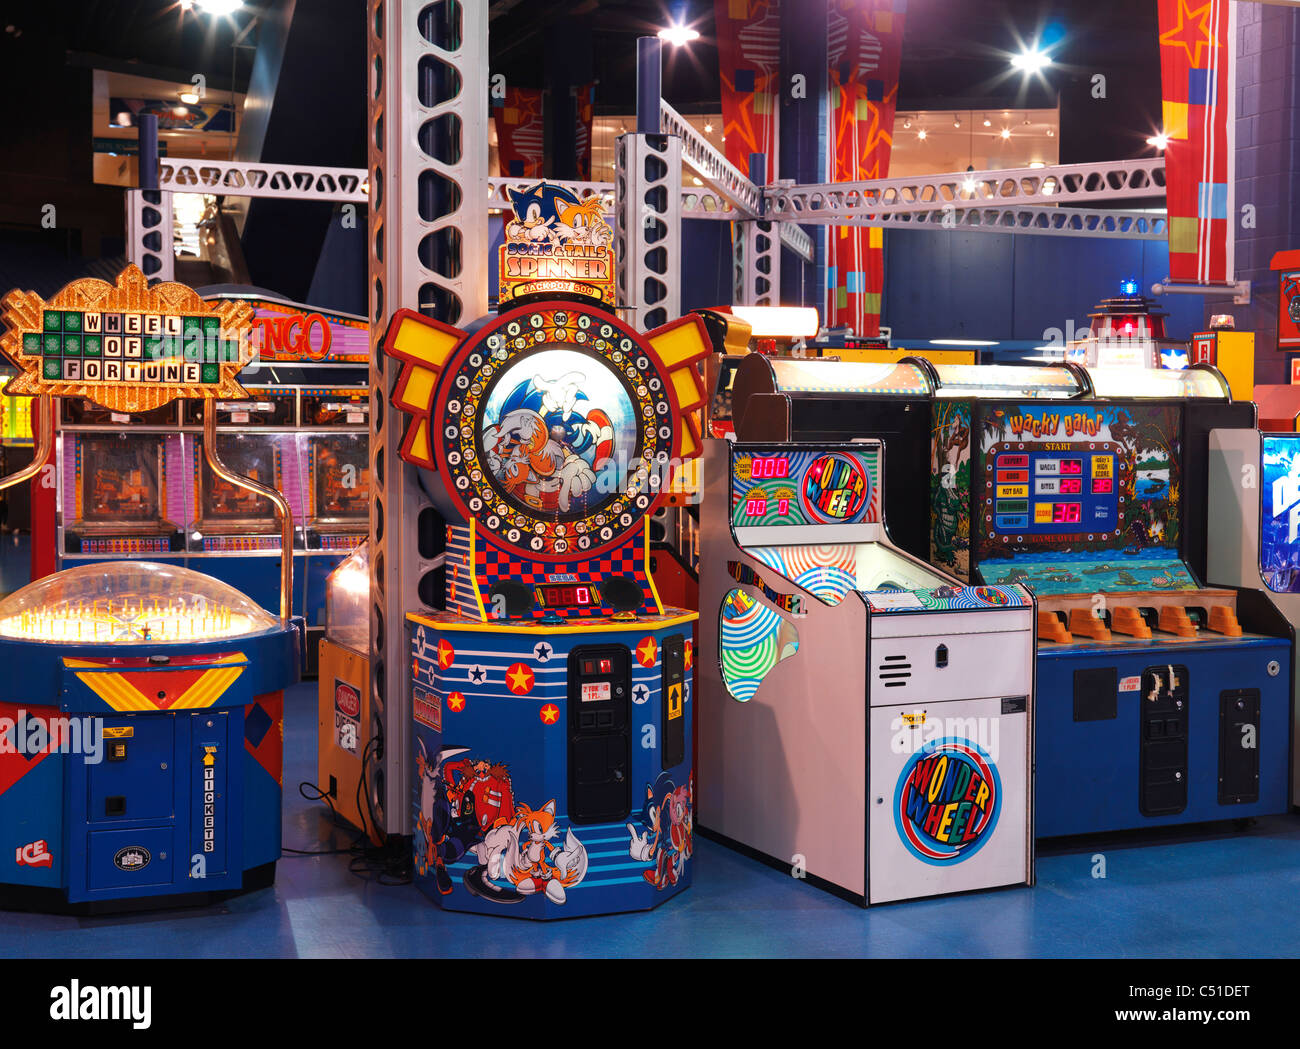 Arcade game machines inside Skylon tower in Niagara Falls, Ontario, Canada. - Stock Image